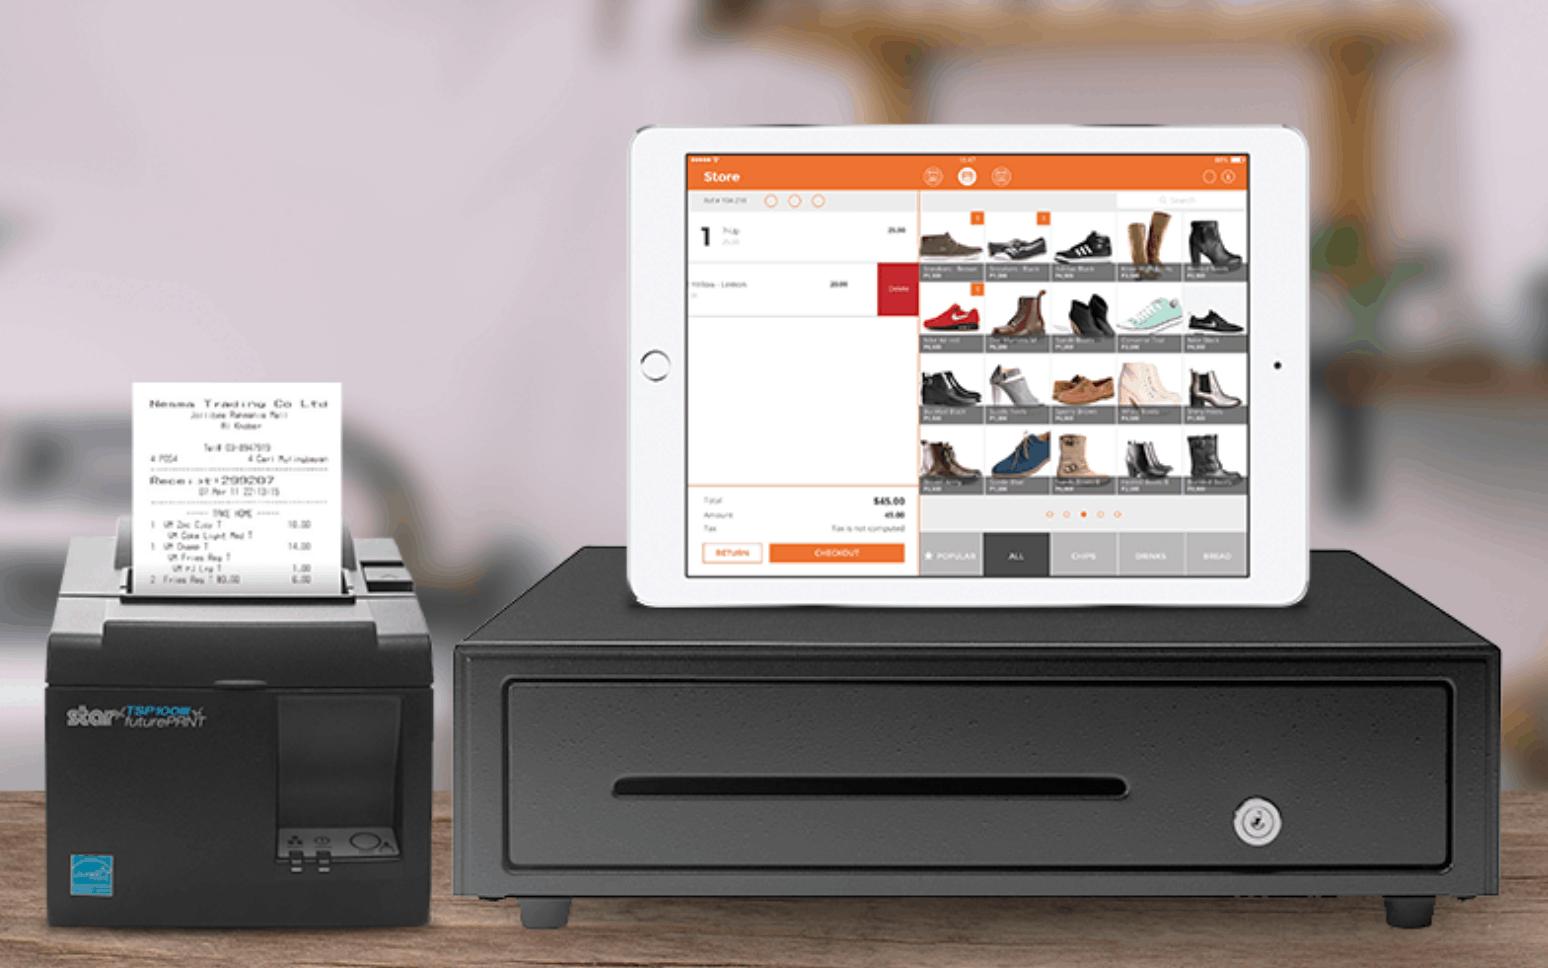 imonggo ipad hardware setup with receipt printer, cash drawer